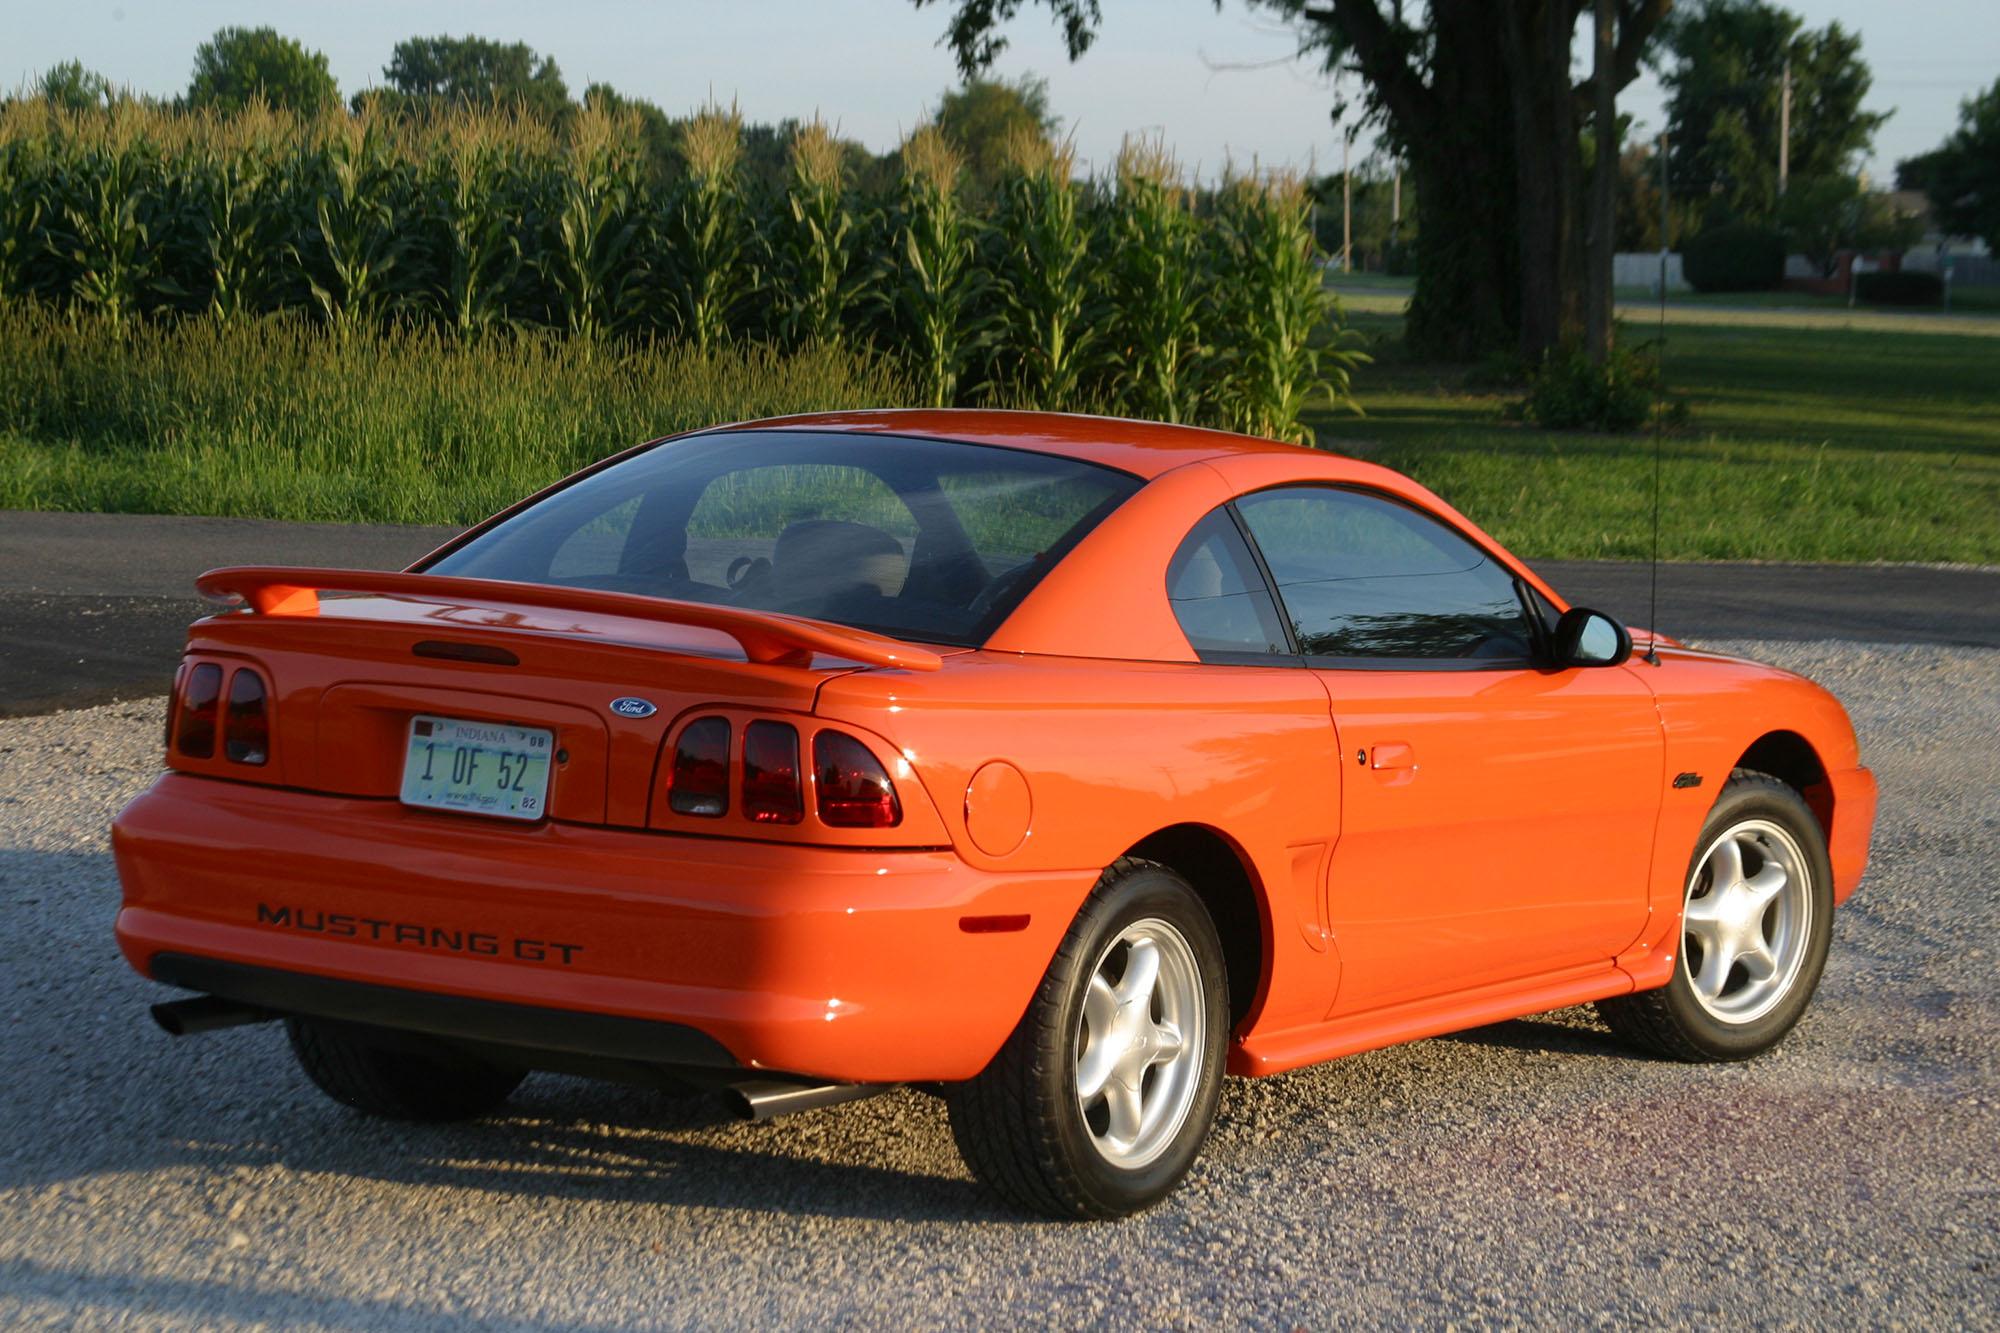 David and Jean's 1996 Mustang rear view